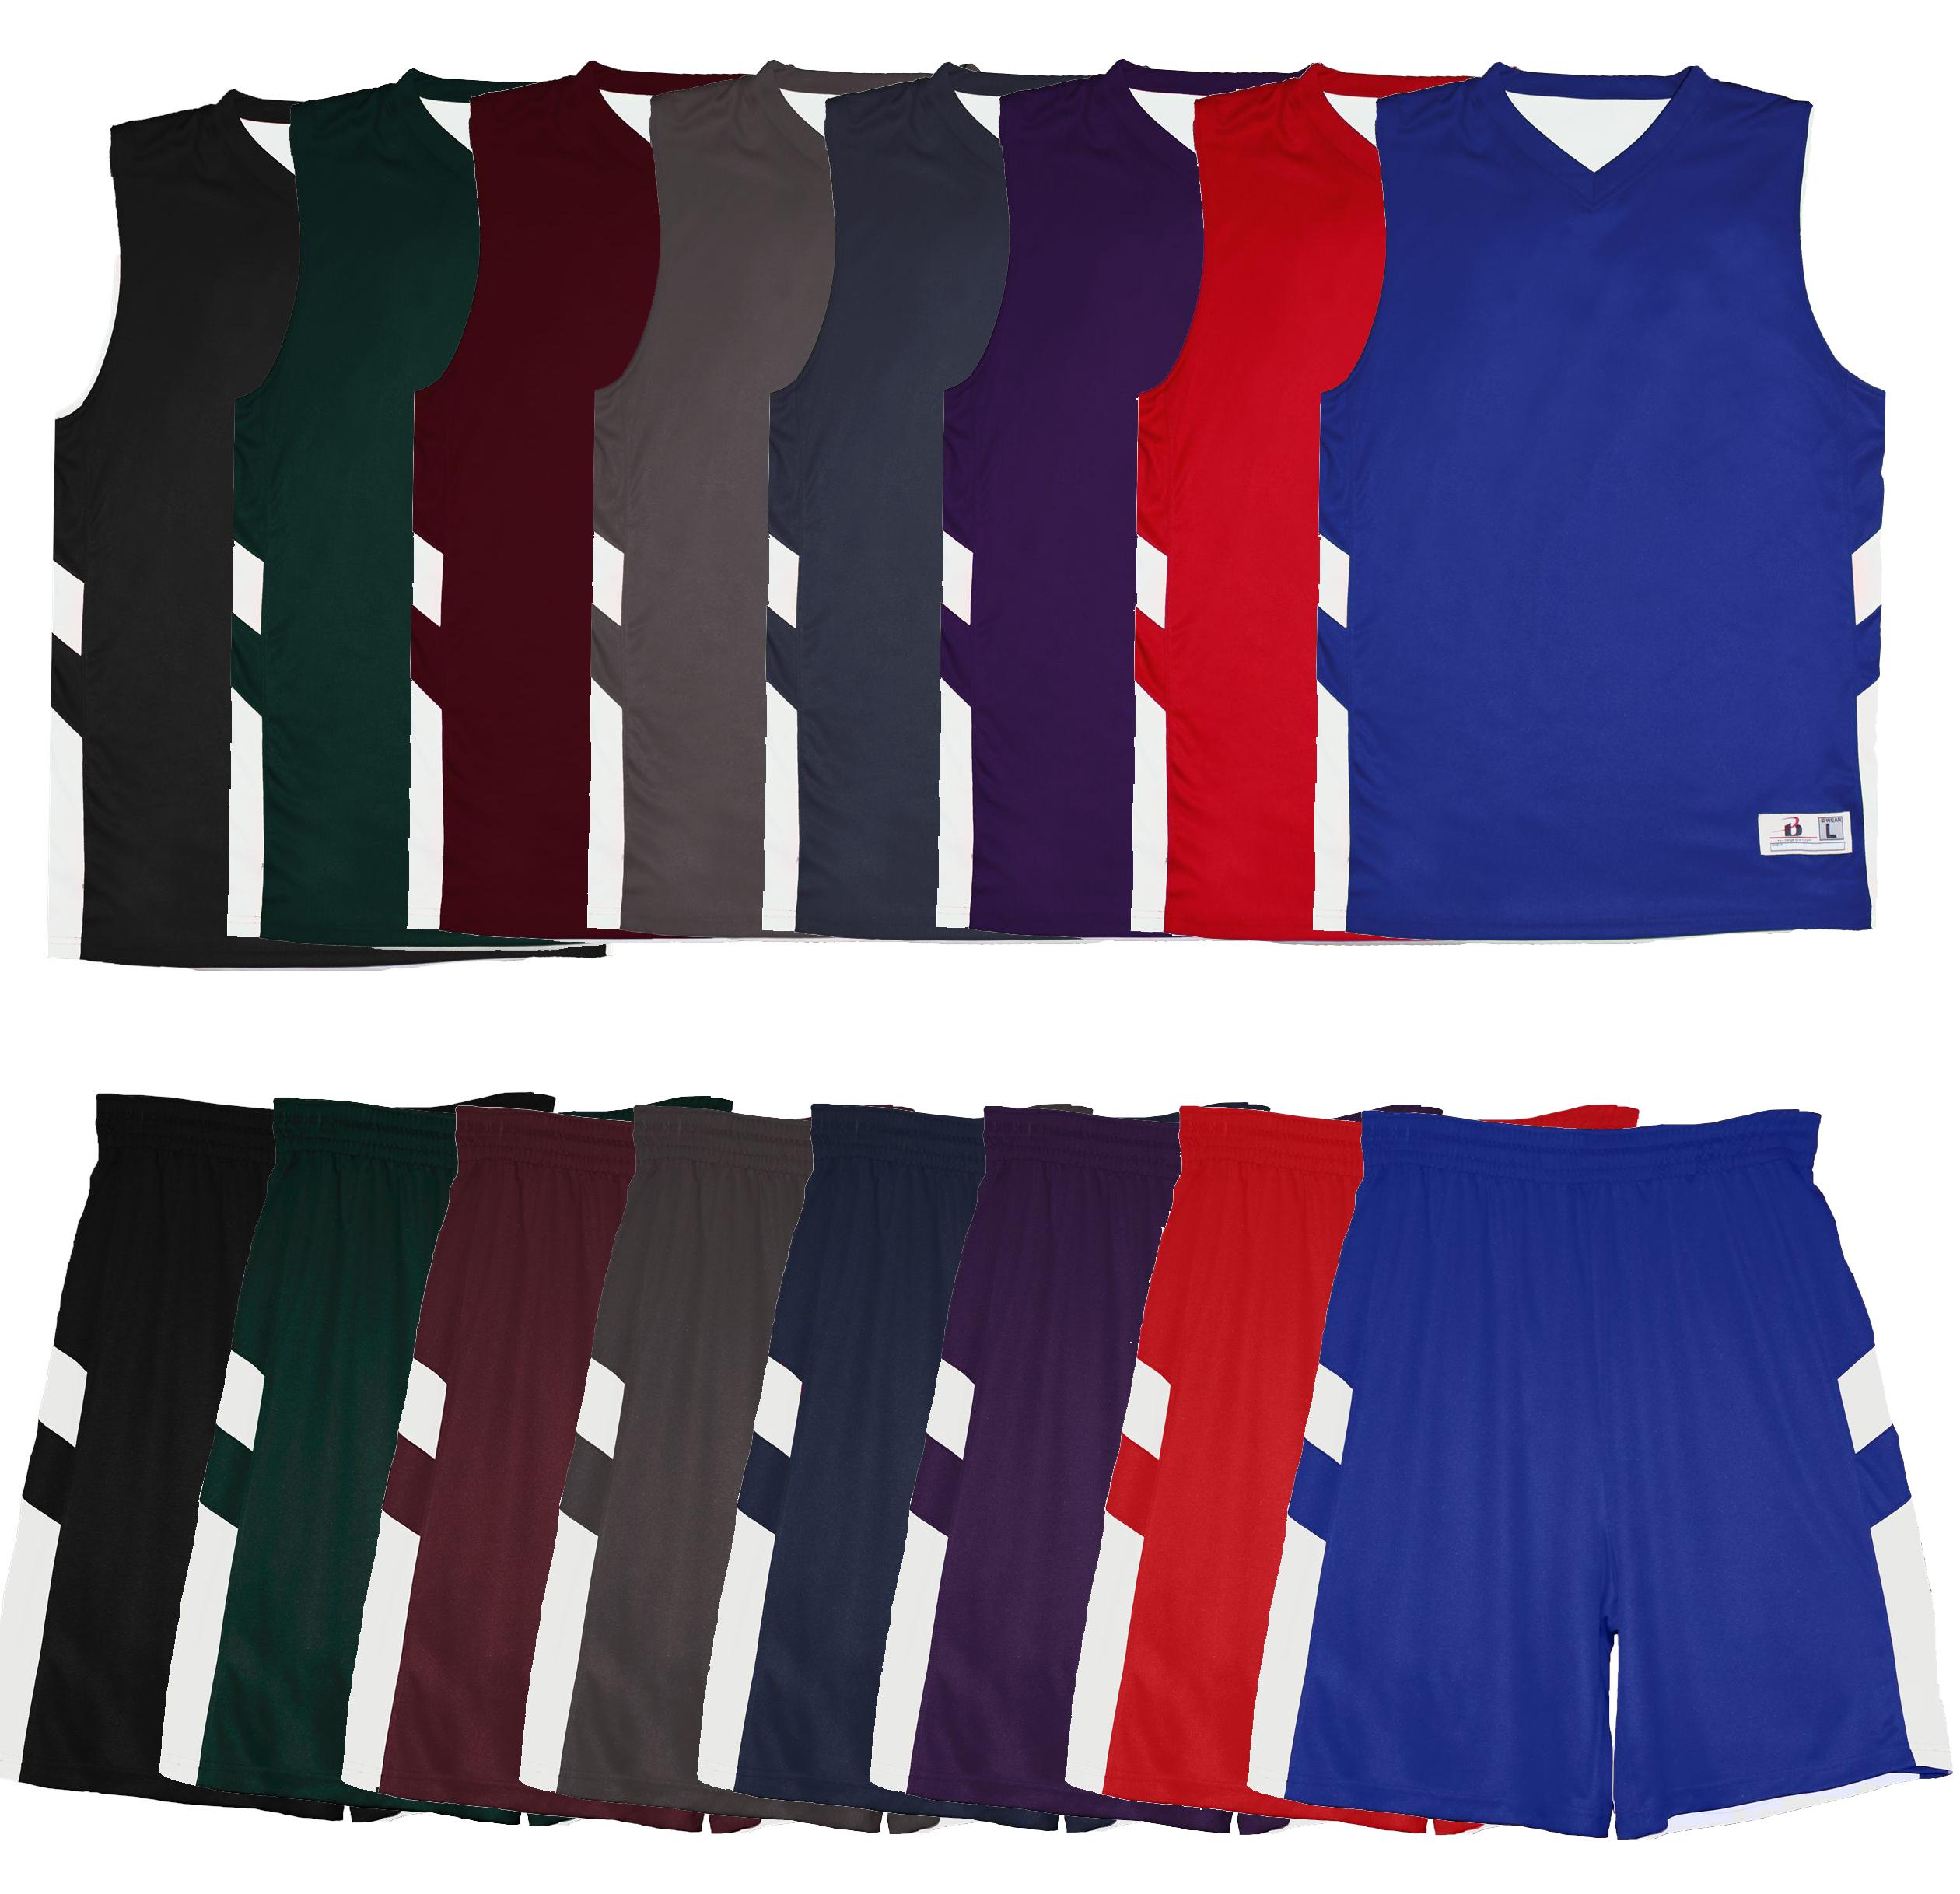 Alleson Mens B-Pivot Reversible Basketball Uniform Set 8566